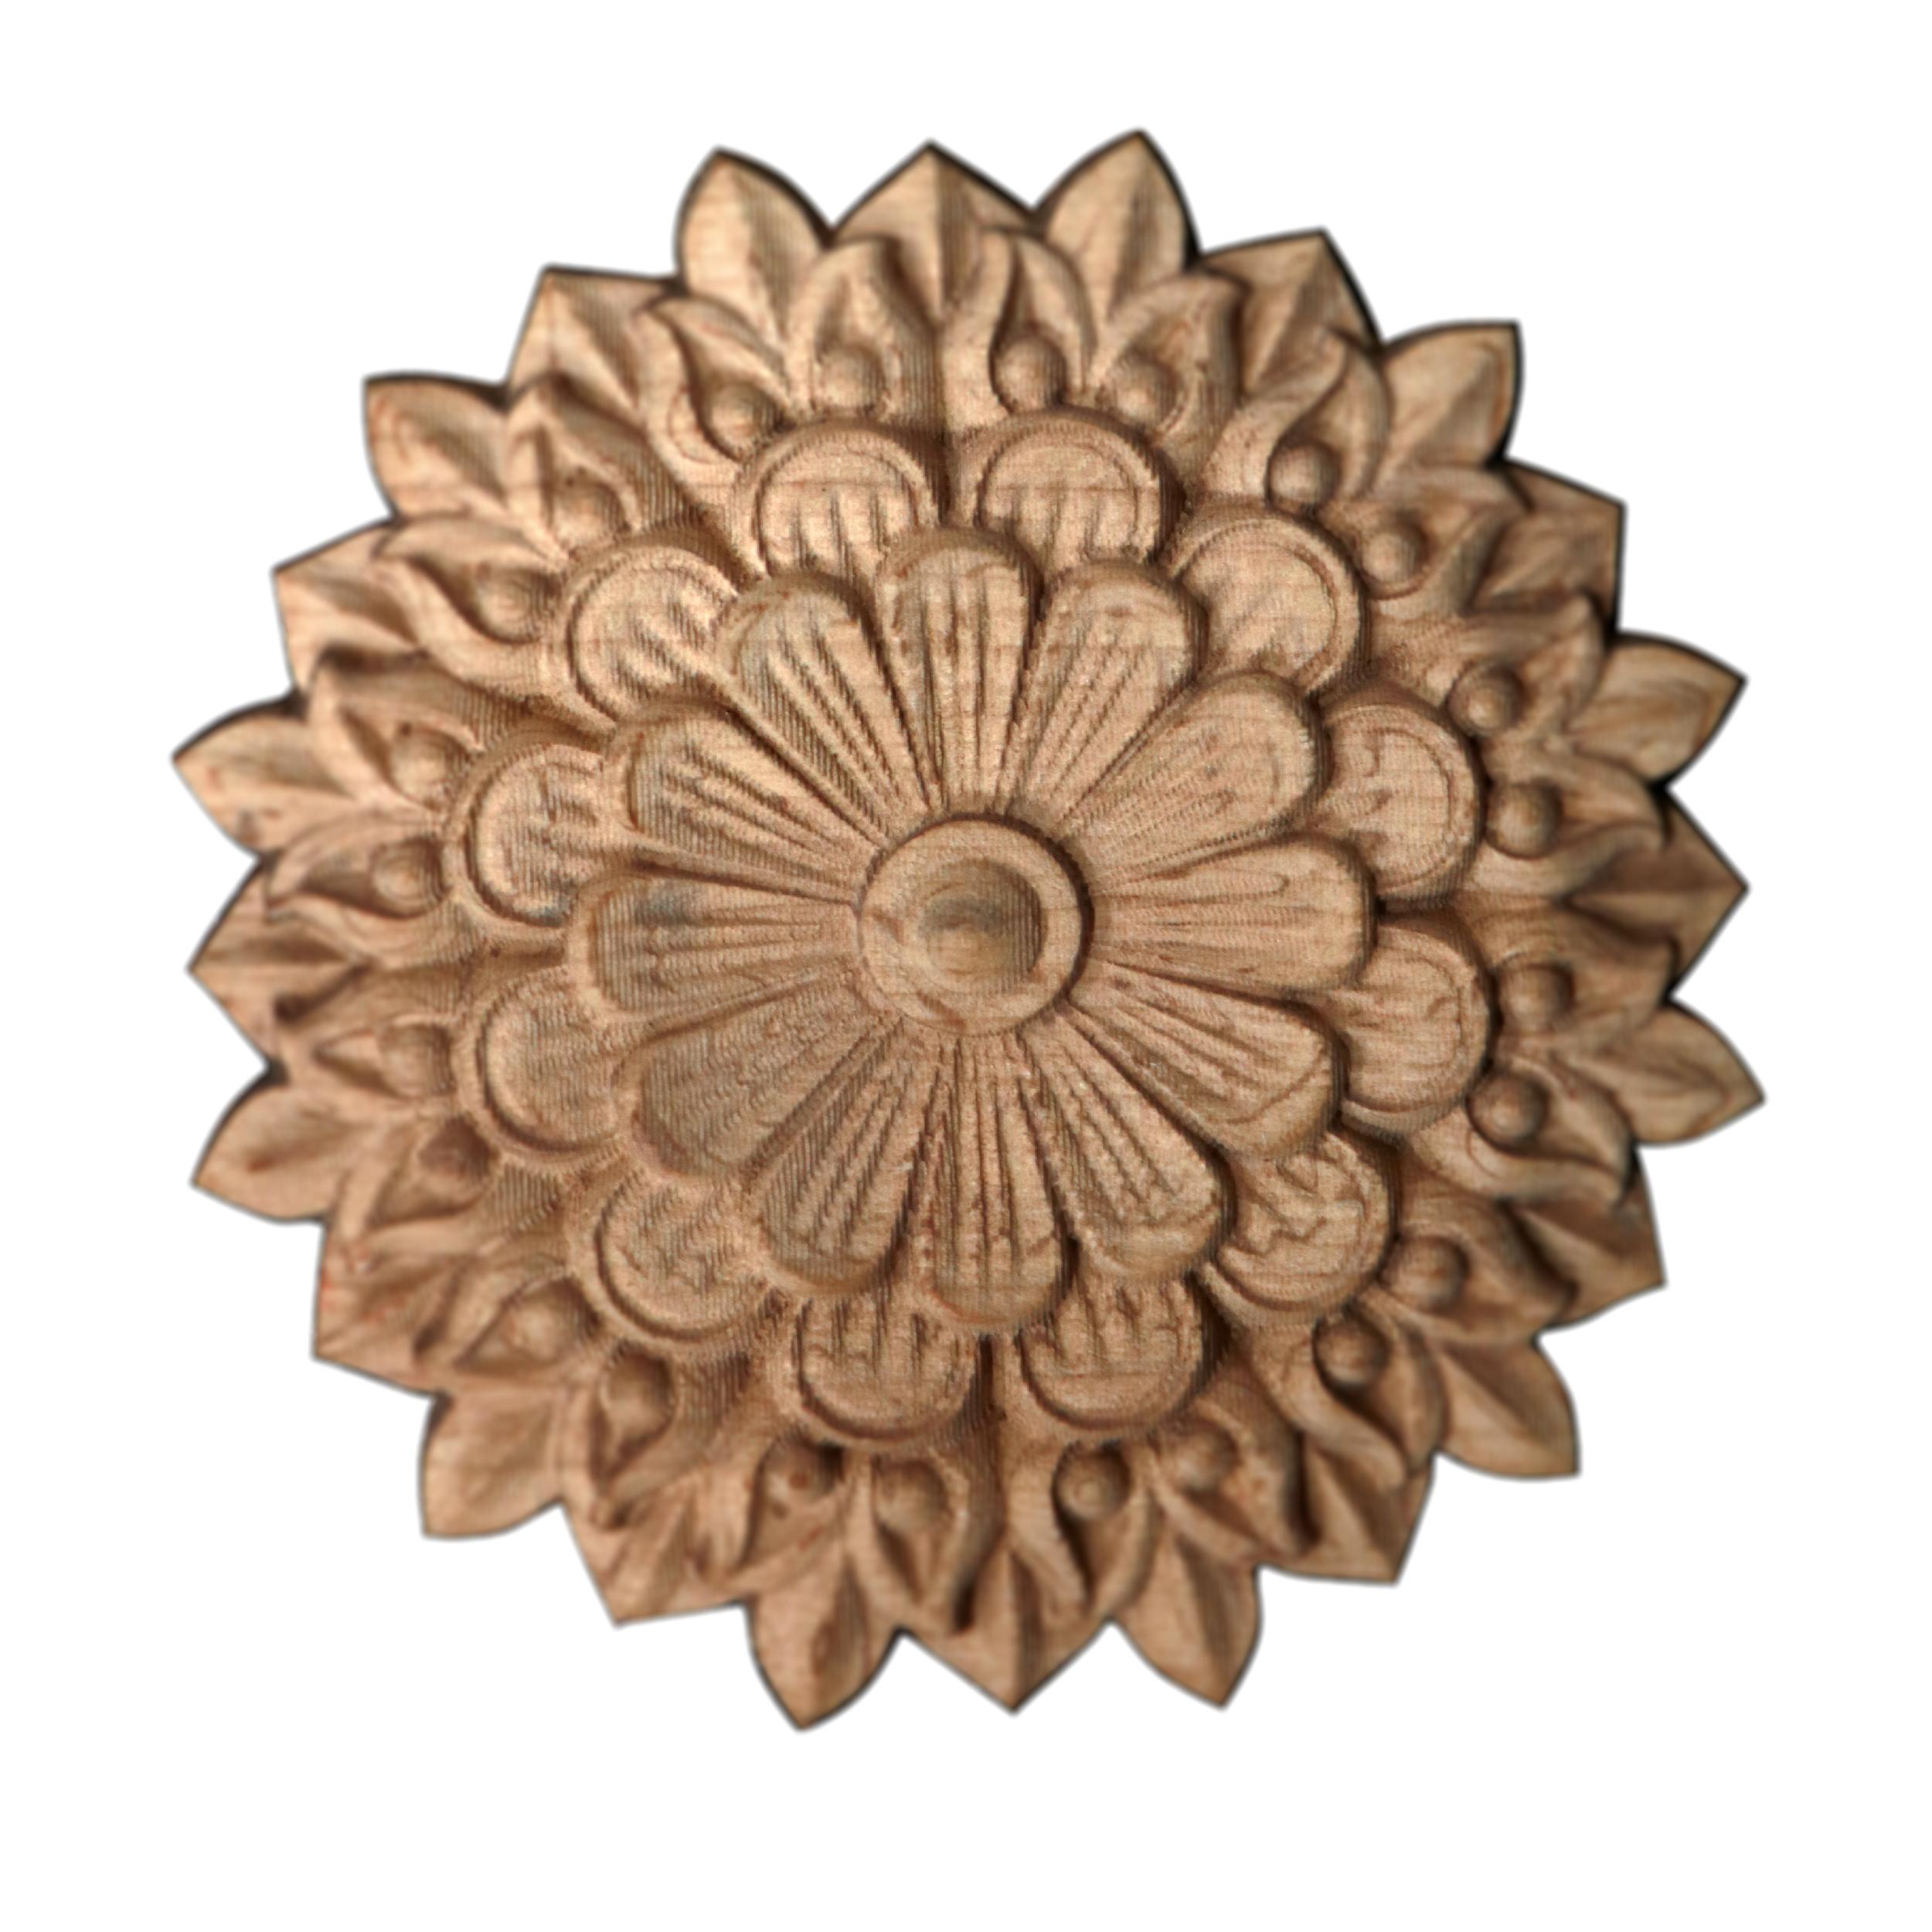 گل منبت کاری مدل دالیا کد ۱-۱۱ D